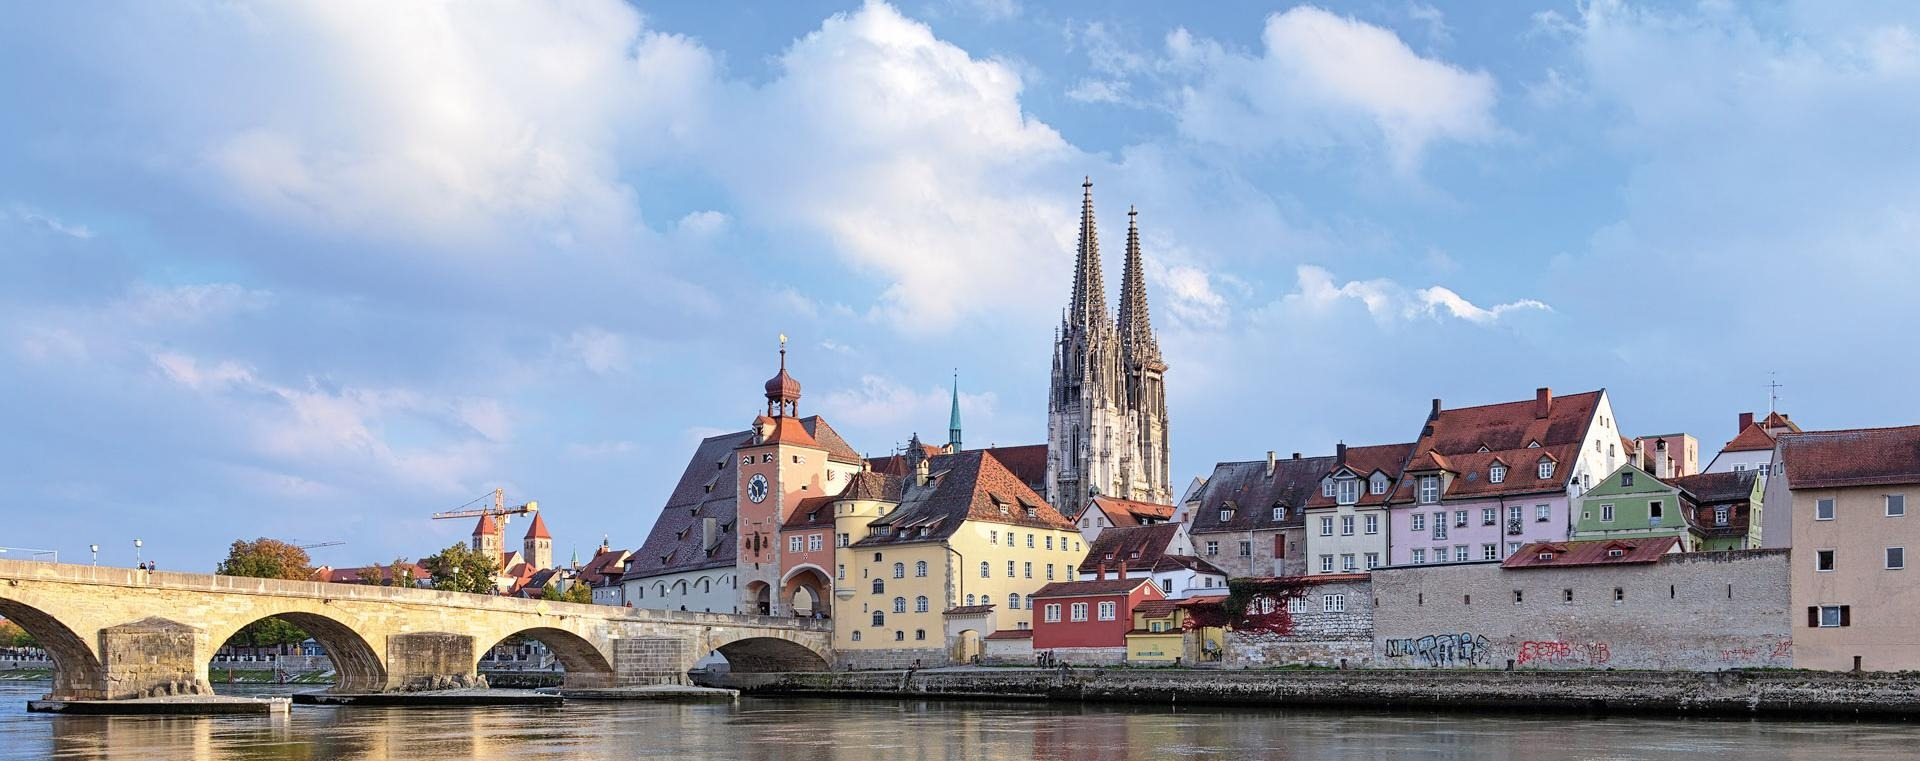 The Blue Danube Cruise